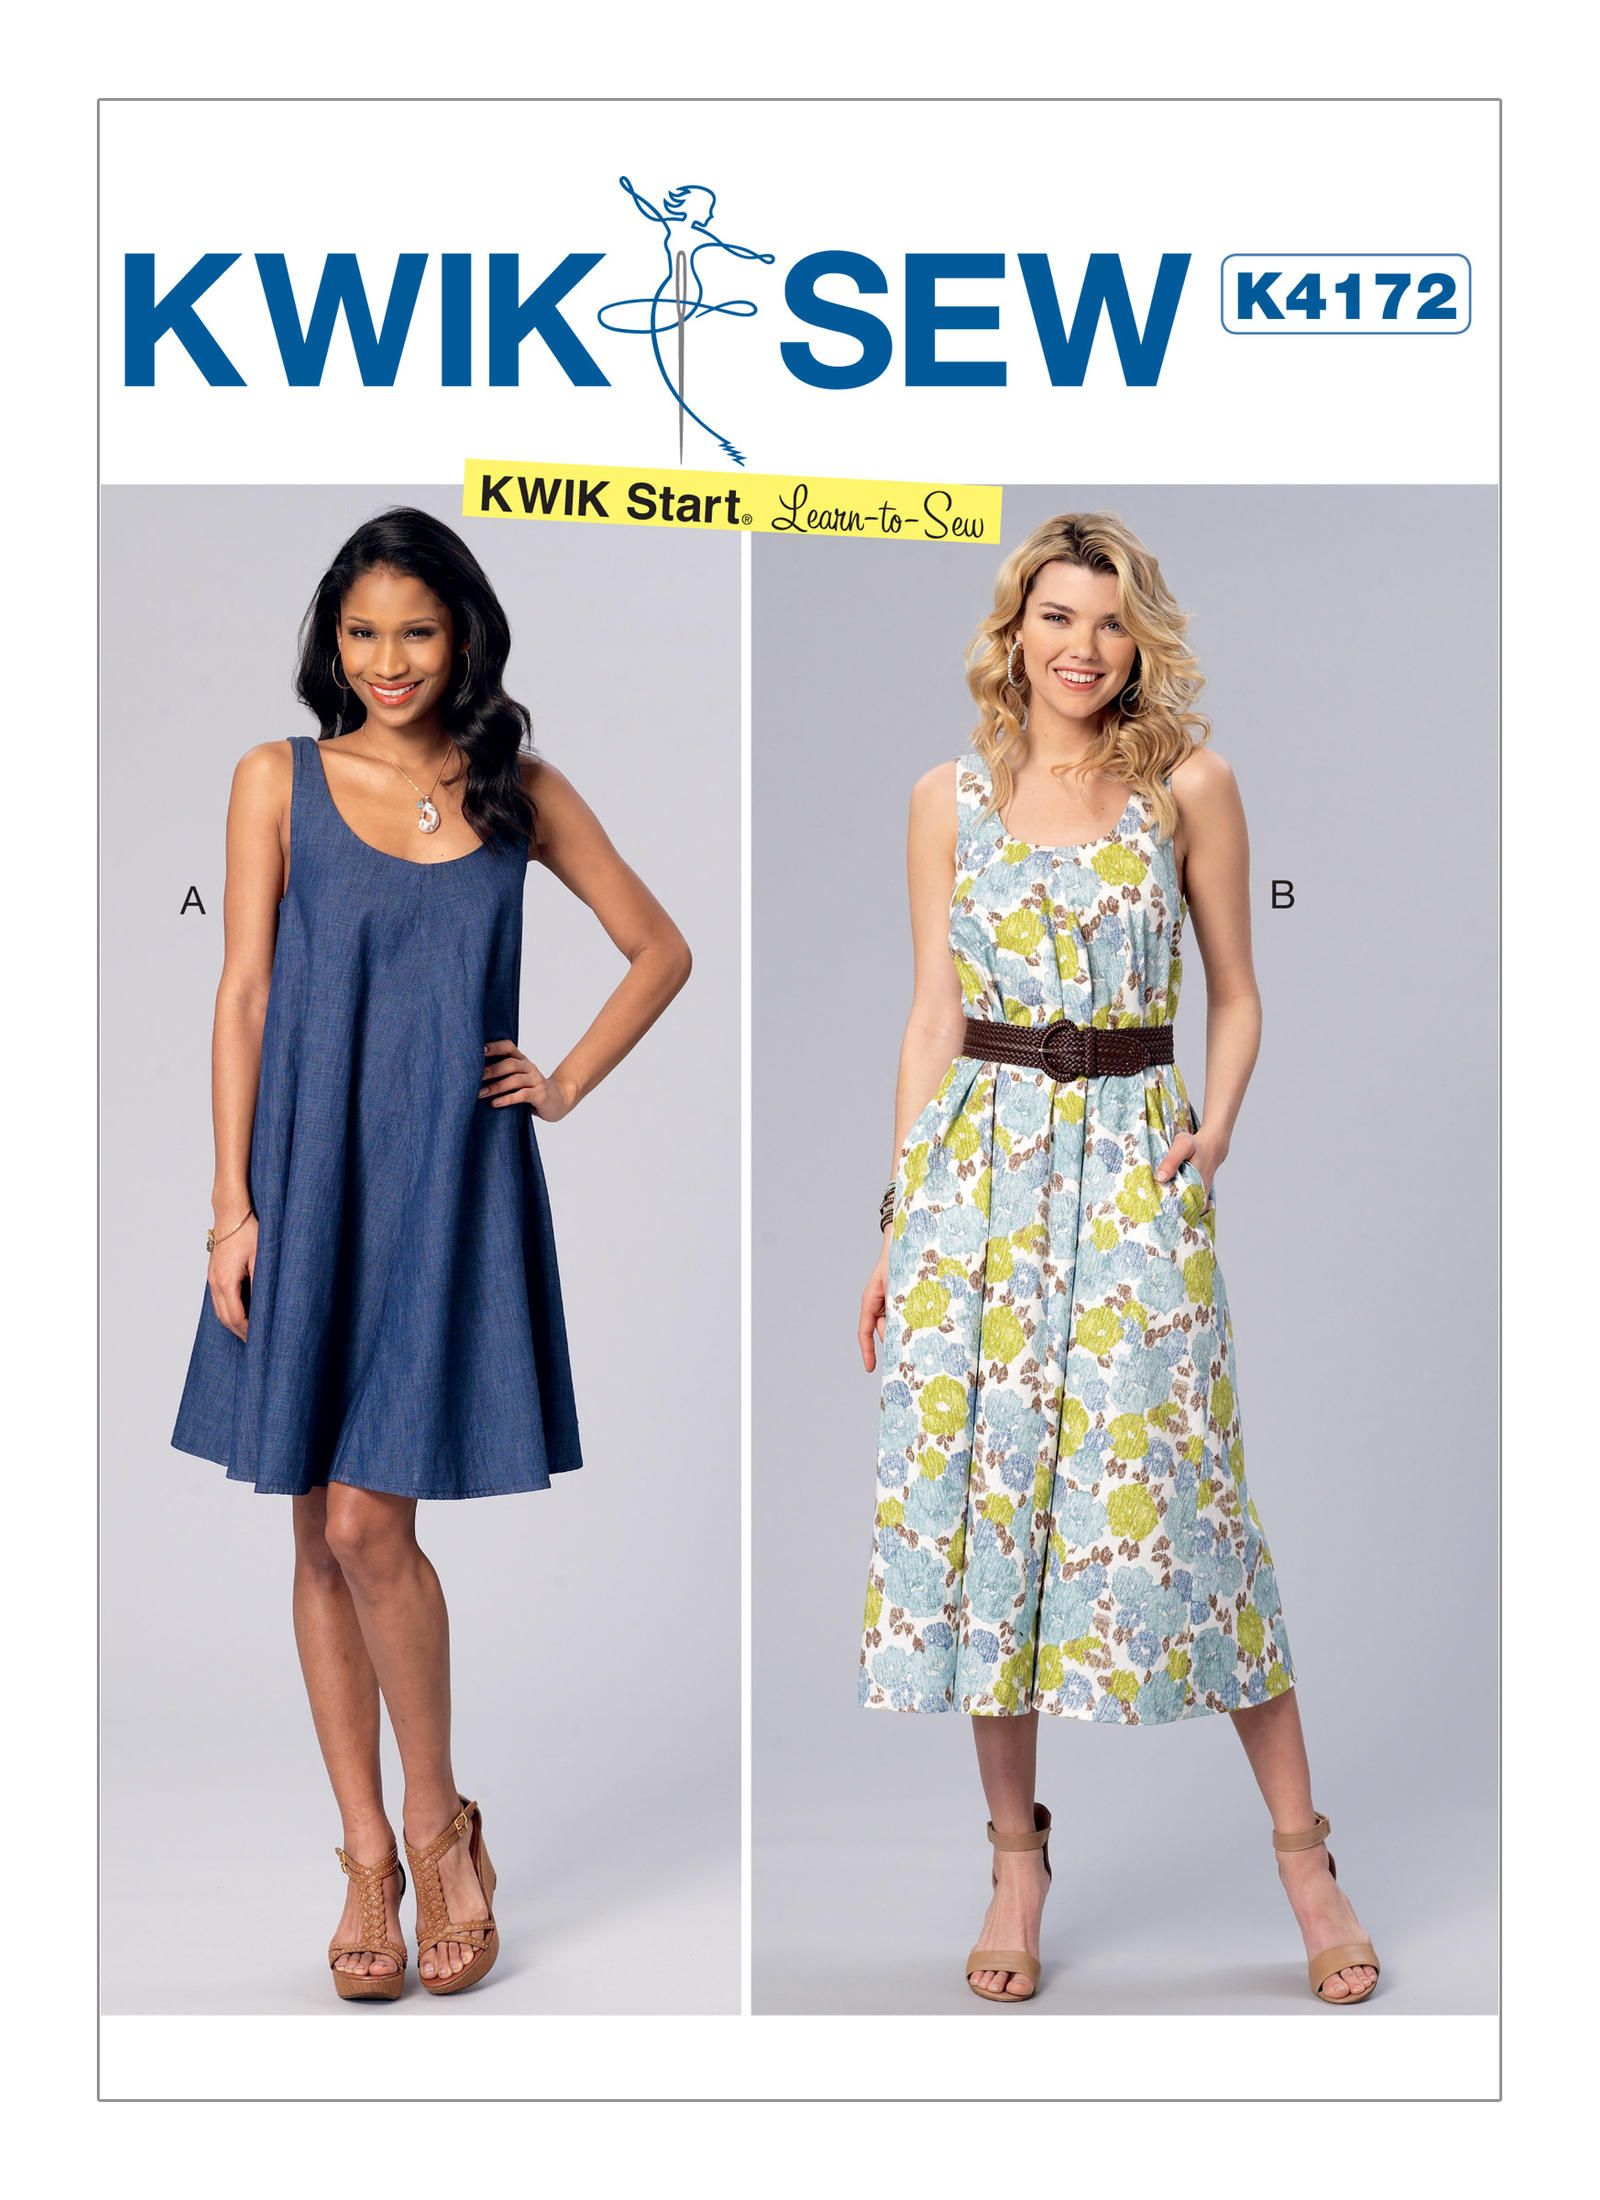 Kwik Sew K4172 | patterns to buy | Pinterest